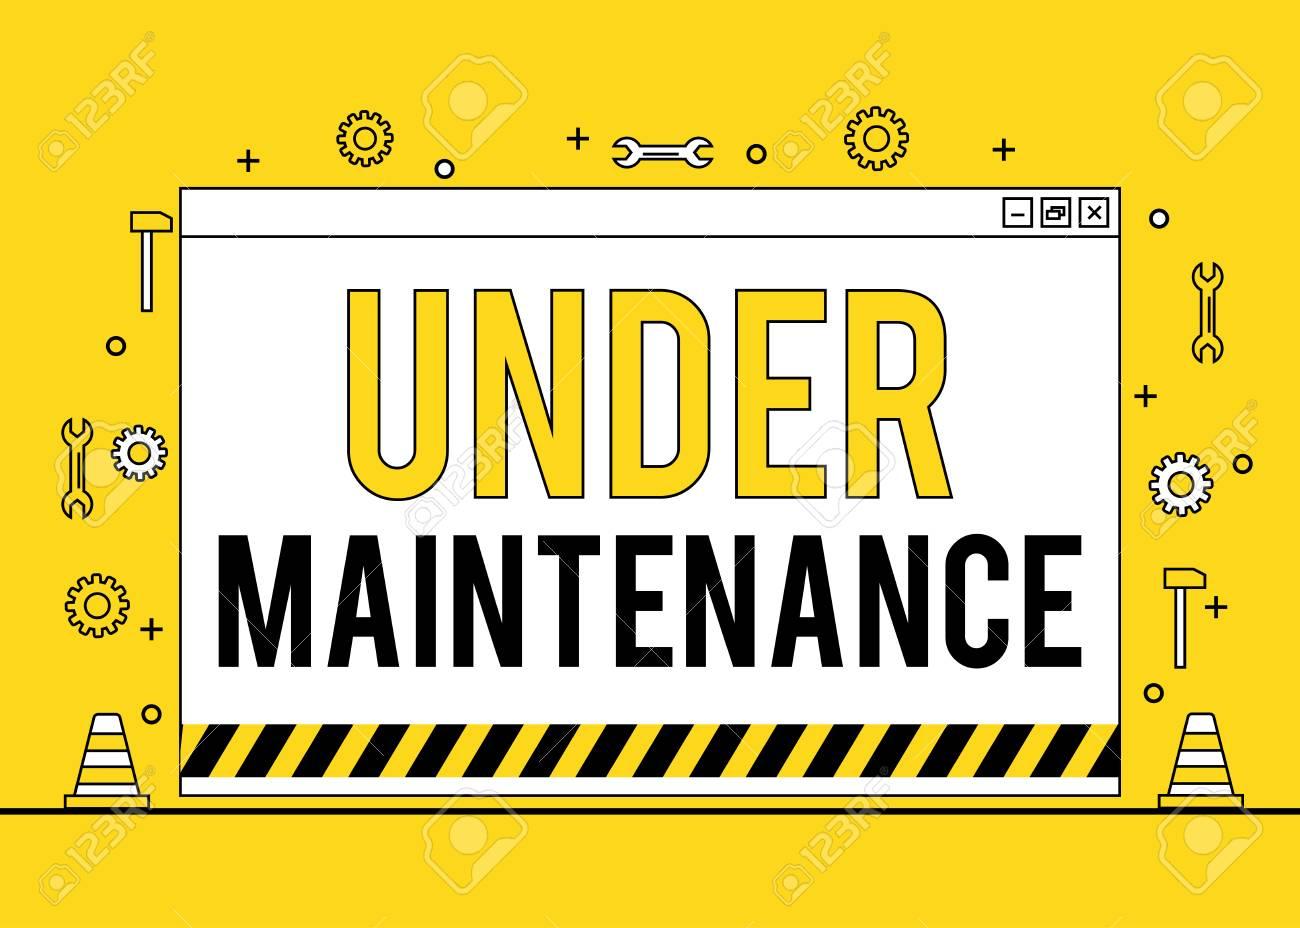 under maintenance logo